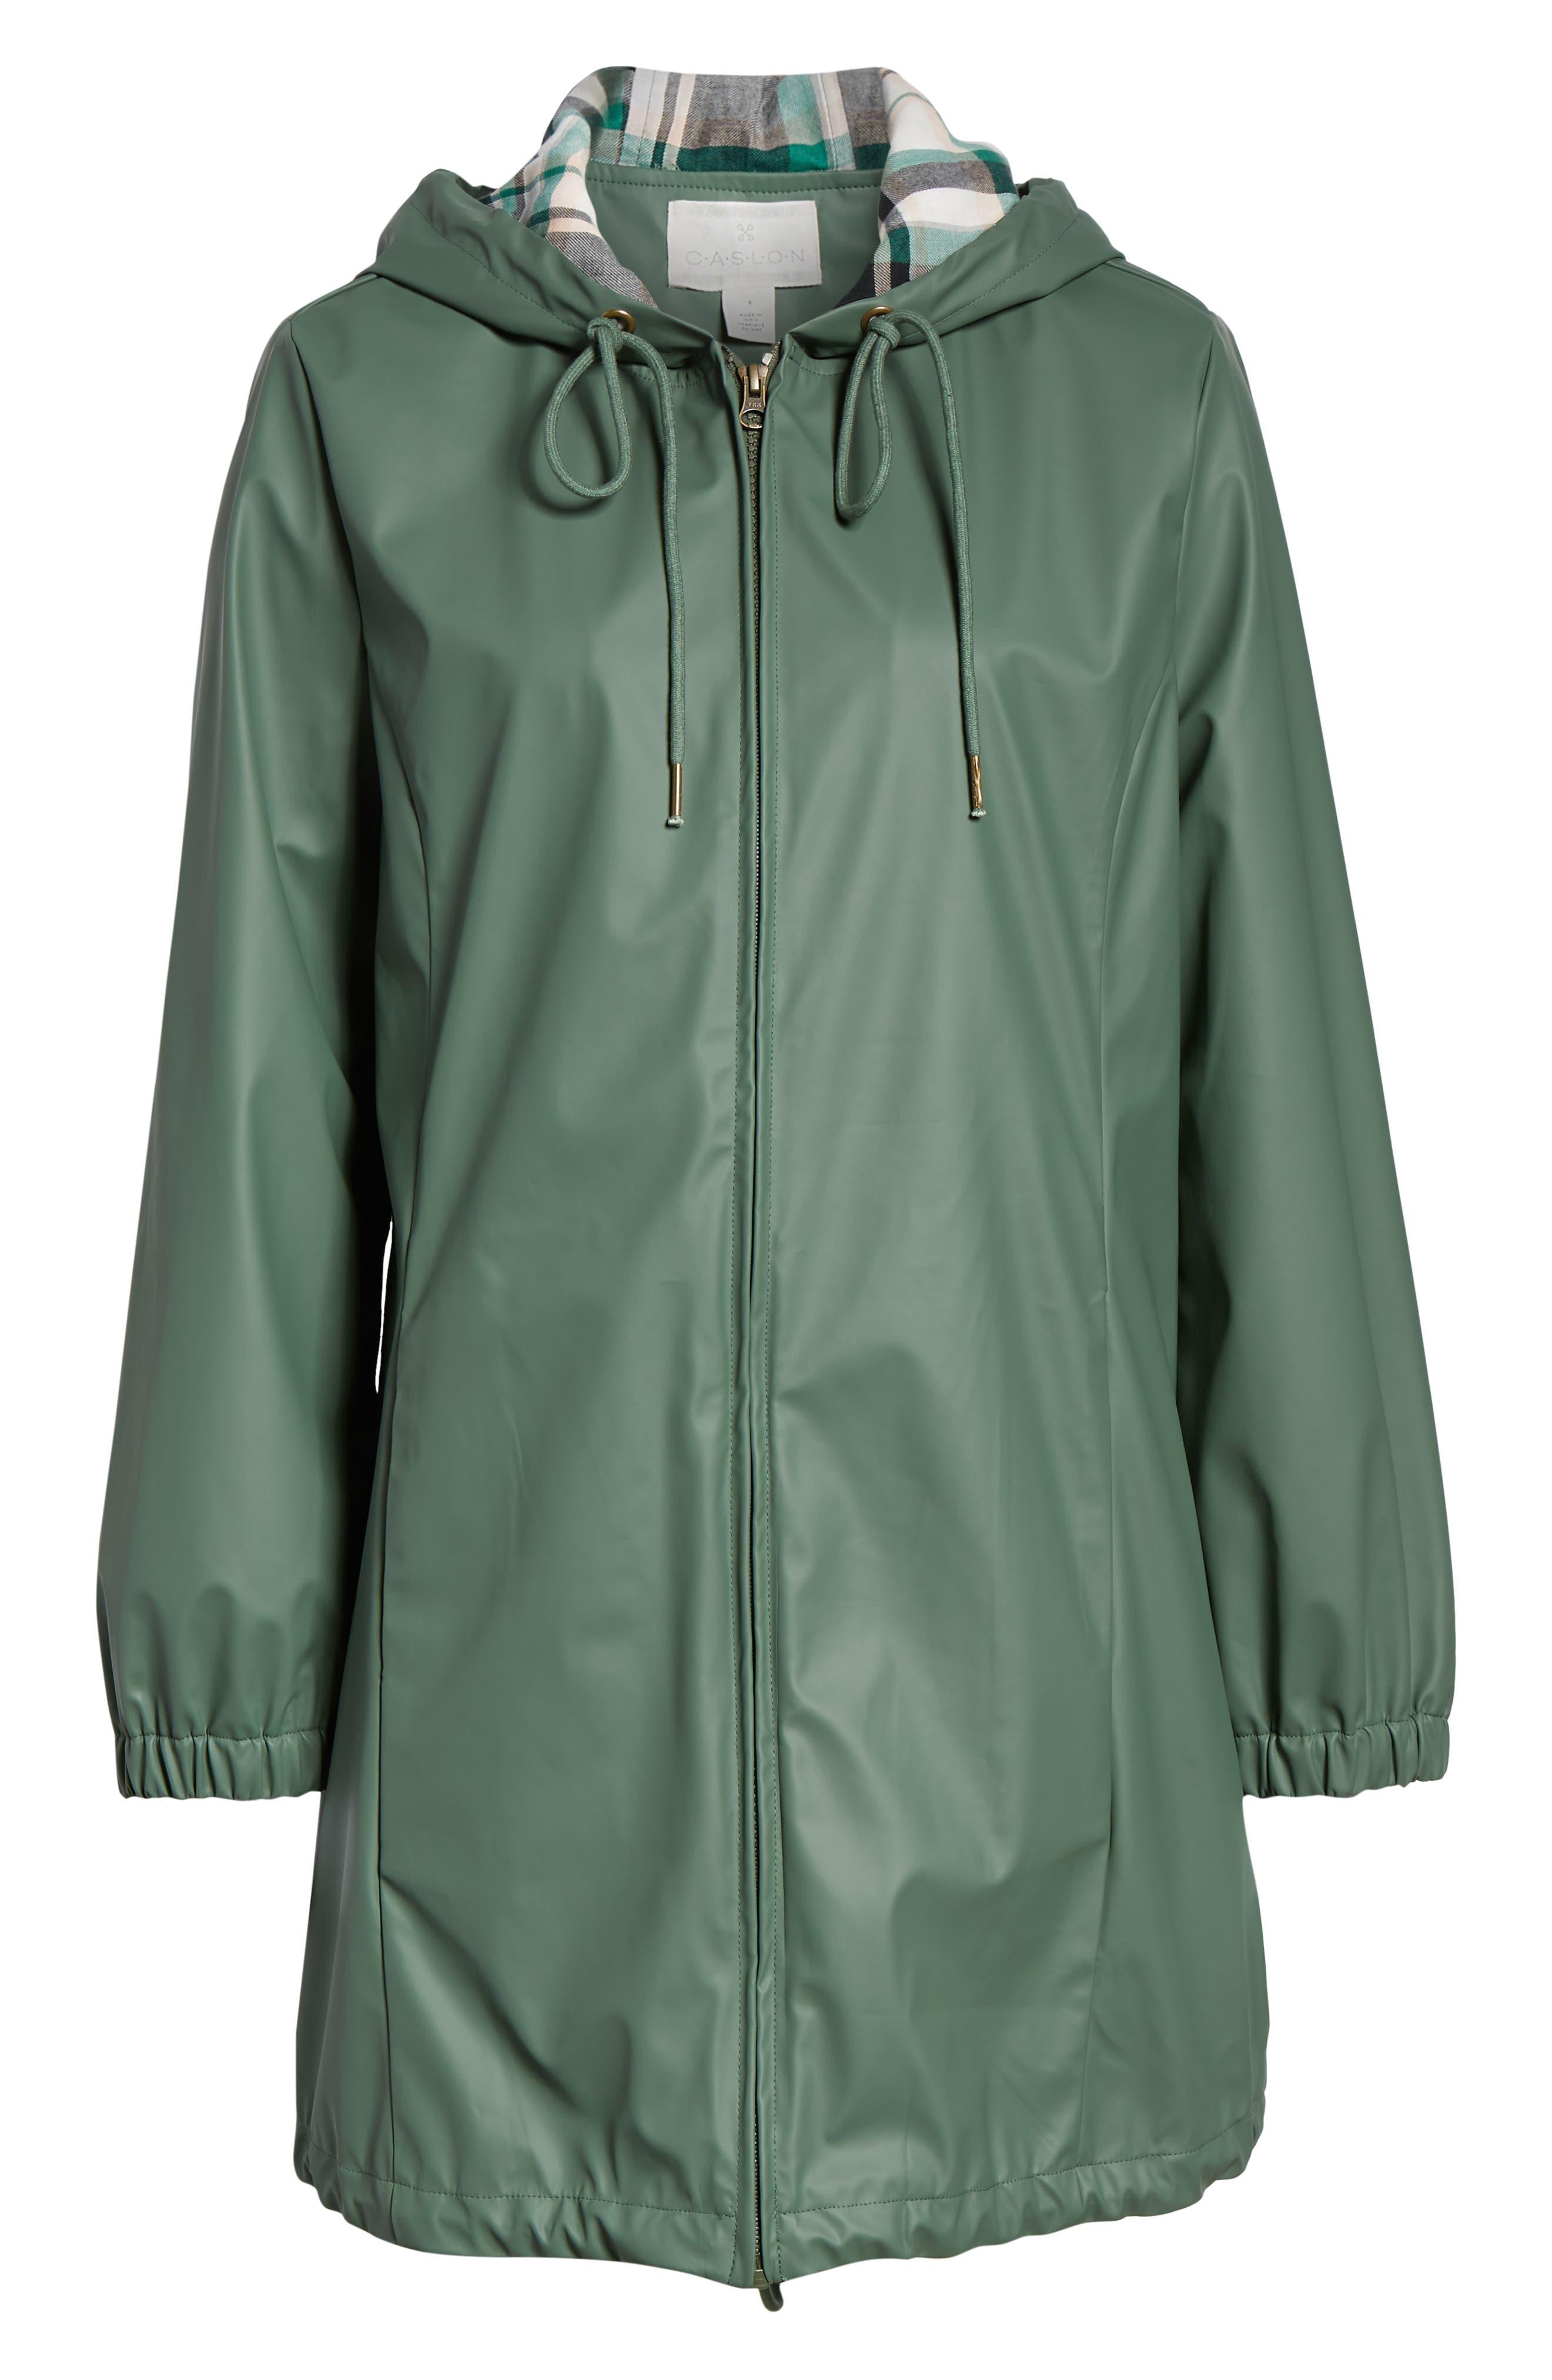 Hooded Rain Jacket,                             Alternate thumbnail 6, color,                             310